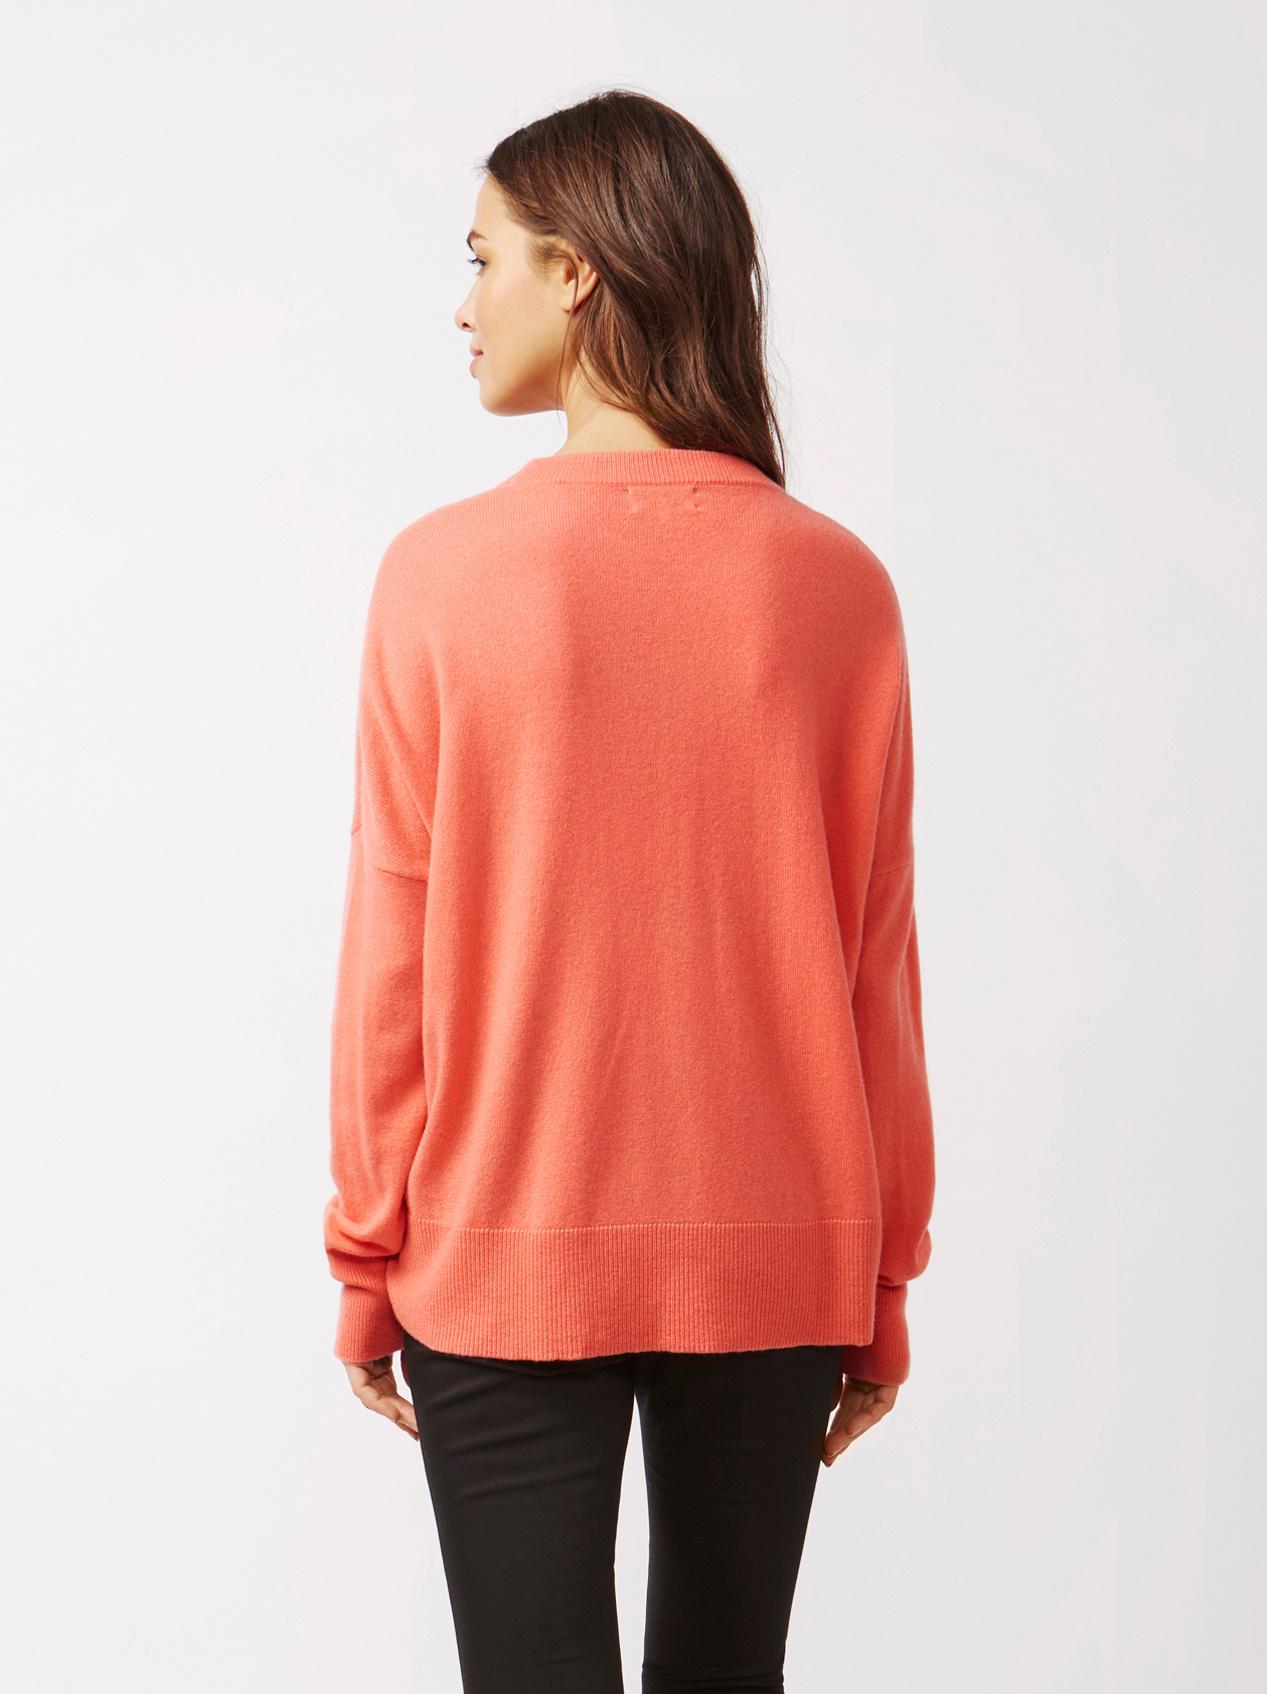 Soft Goat Women's Boyfriend Sweater Tropicana